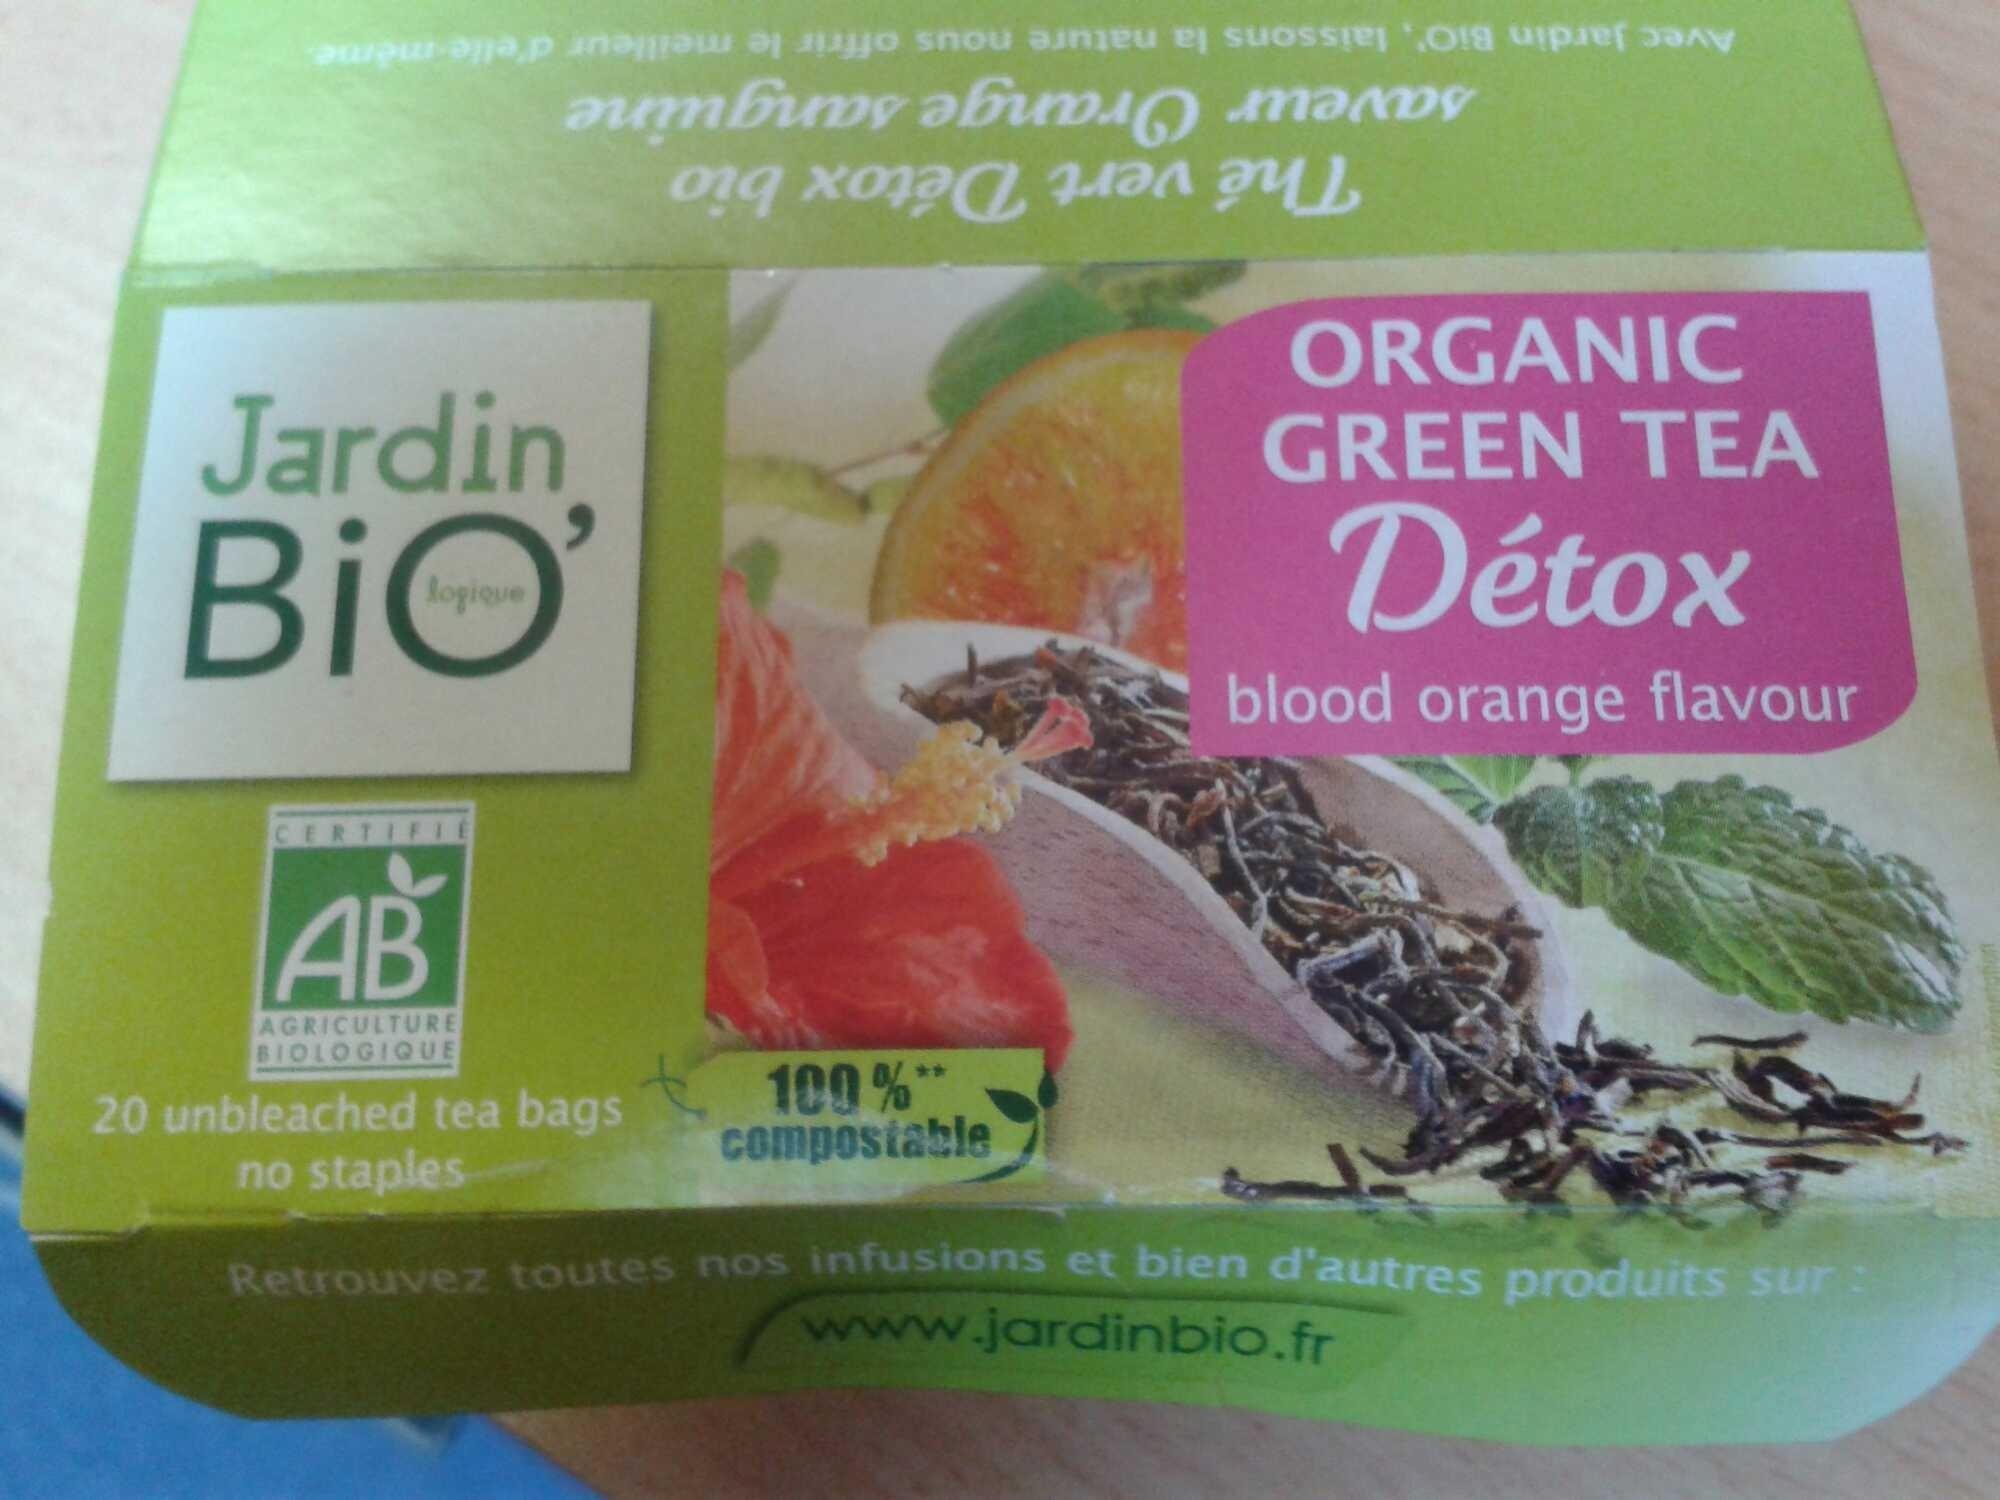 Thé Vert Detox Arôme Orange Sanguine - Jardin Bio - 30 G à Infusion Jardin Bio